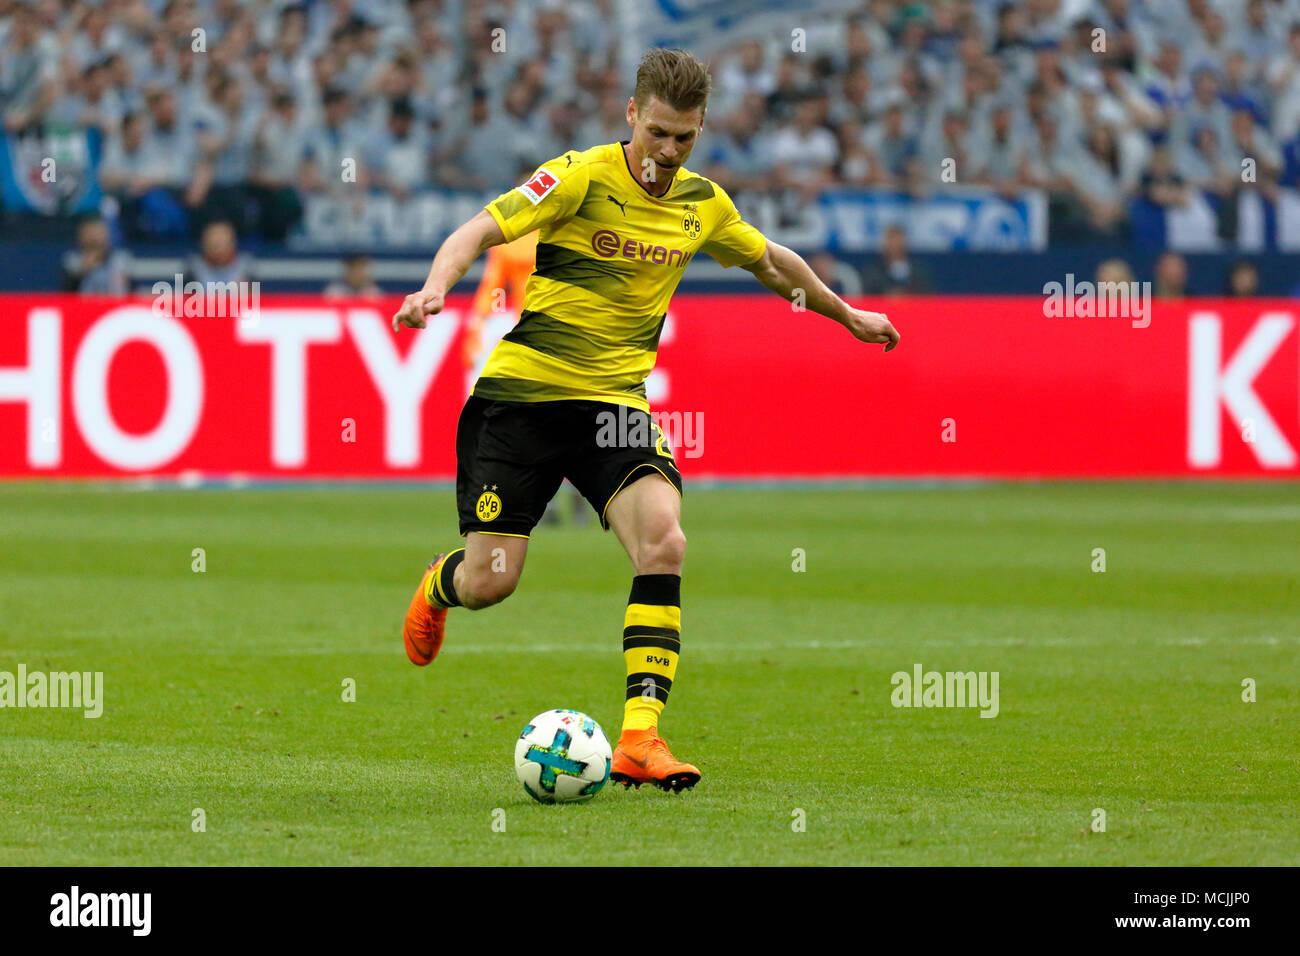 sports, football, Bundesliga, 2017/2018, FC Schalke 04 vs BVB Borussia Dortmund 2:0, Veltins Arena Gelsenkirchen, scene of the match, Lukasz Piszczek (BVB) in ball possession - Stock Image